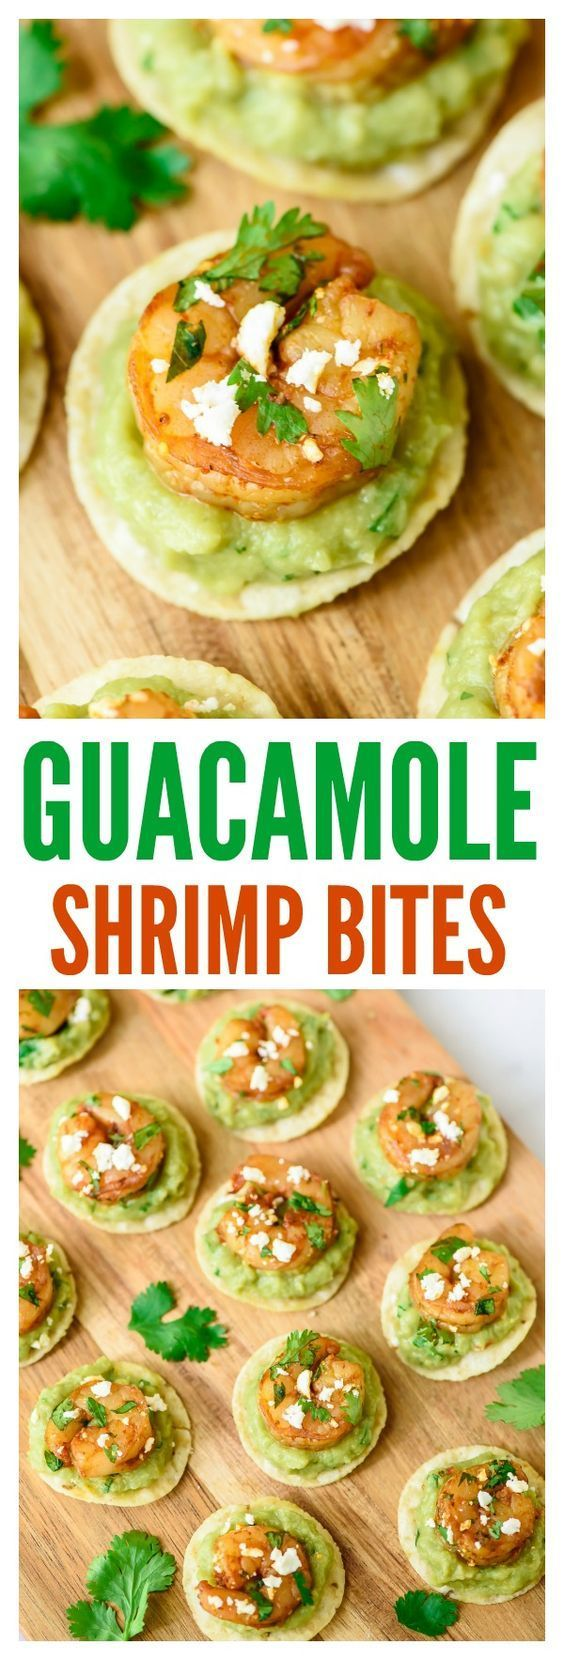 Spicy Guacamole Shrimp Bites. Fast, easy, and SO addictive